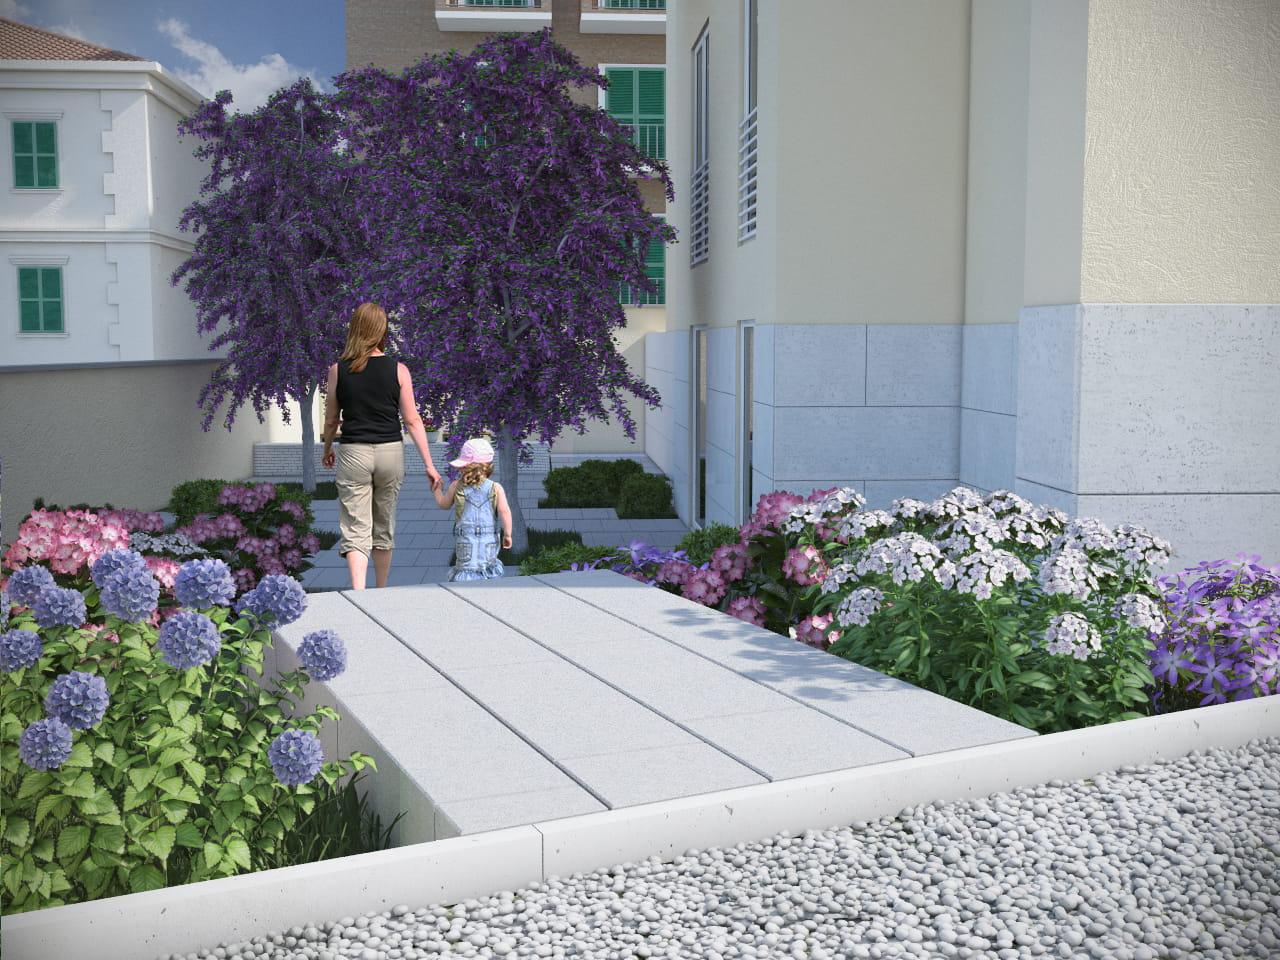 Studio di grafica 3d stefanomimmocchirendering render for Rendering giardino